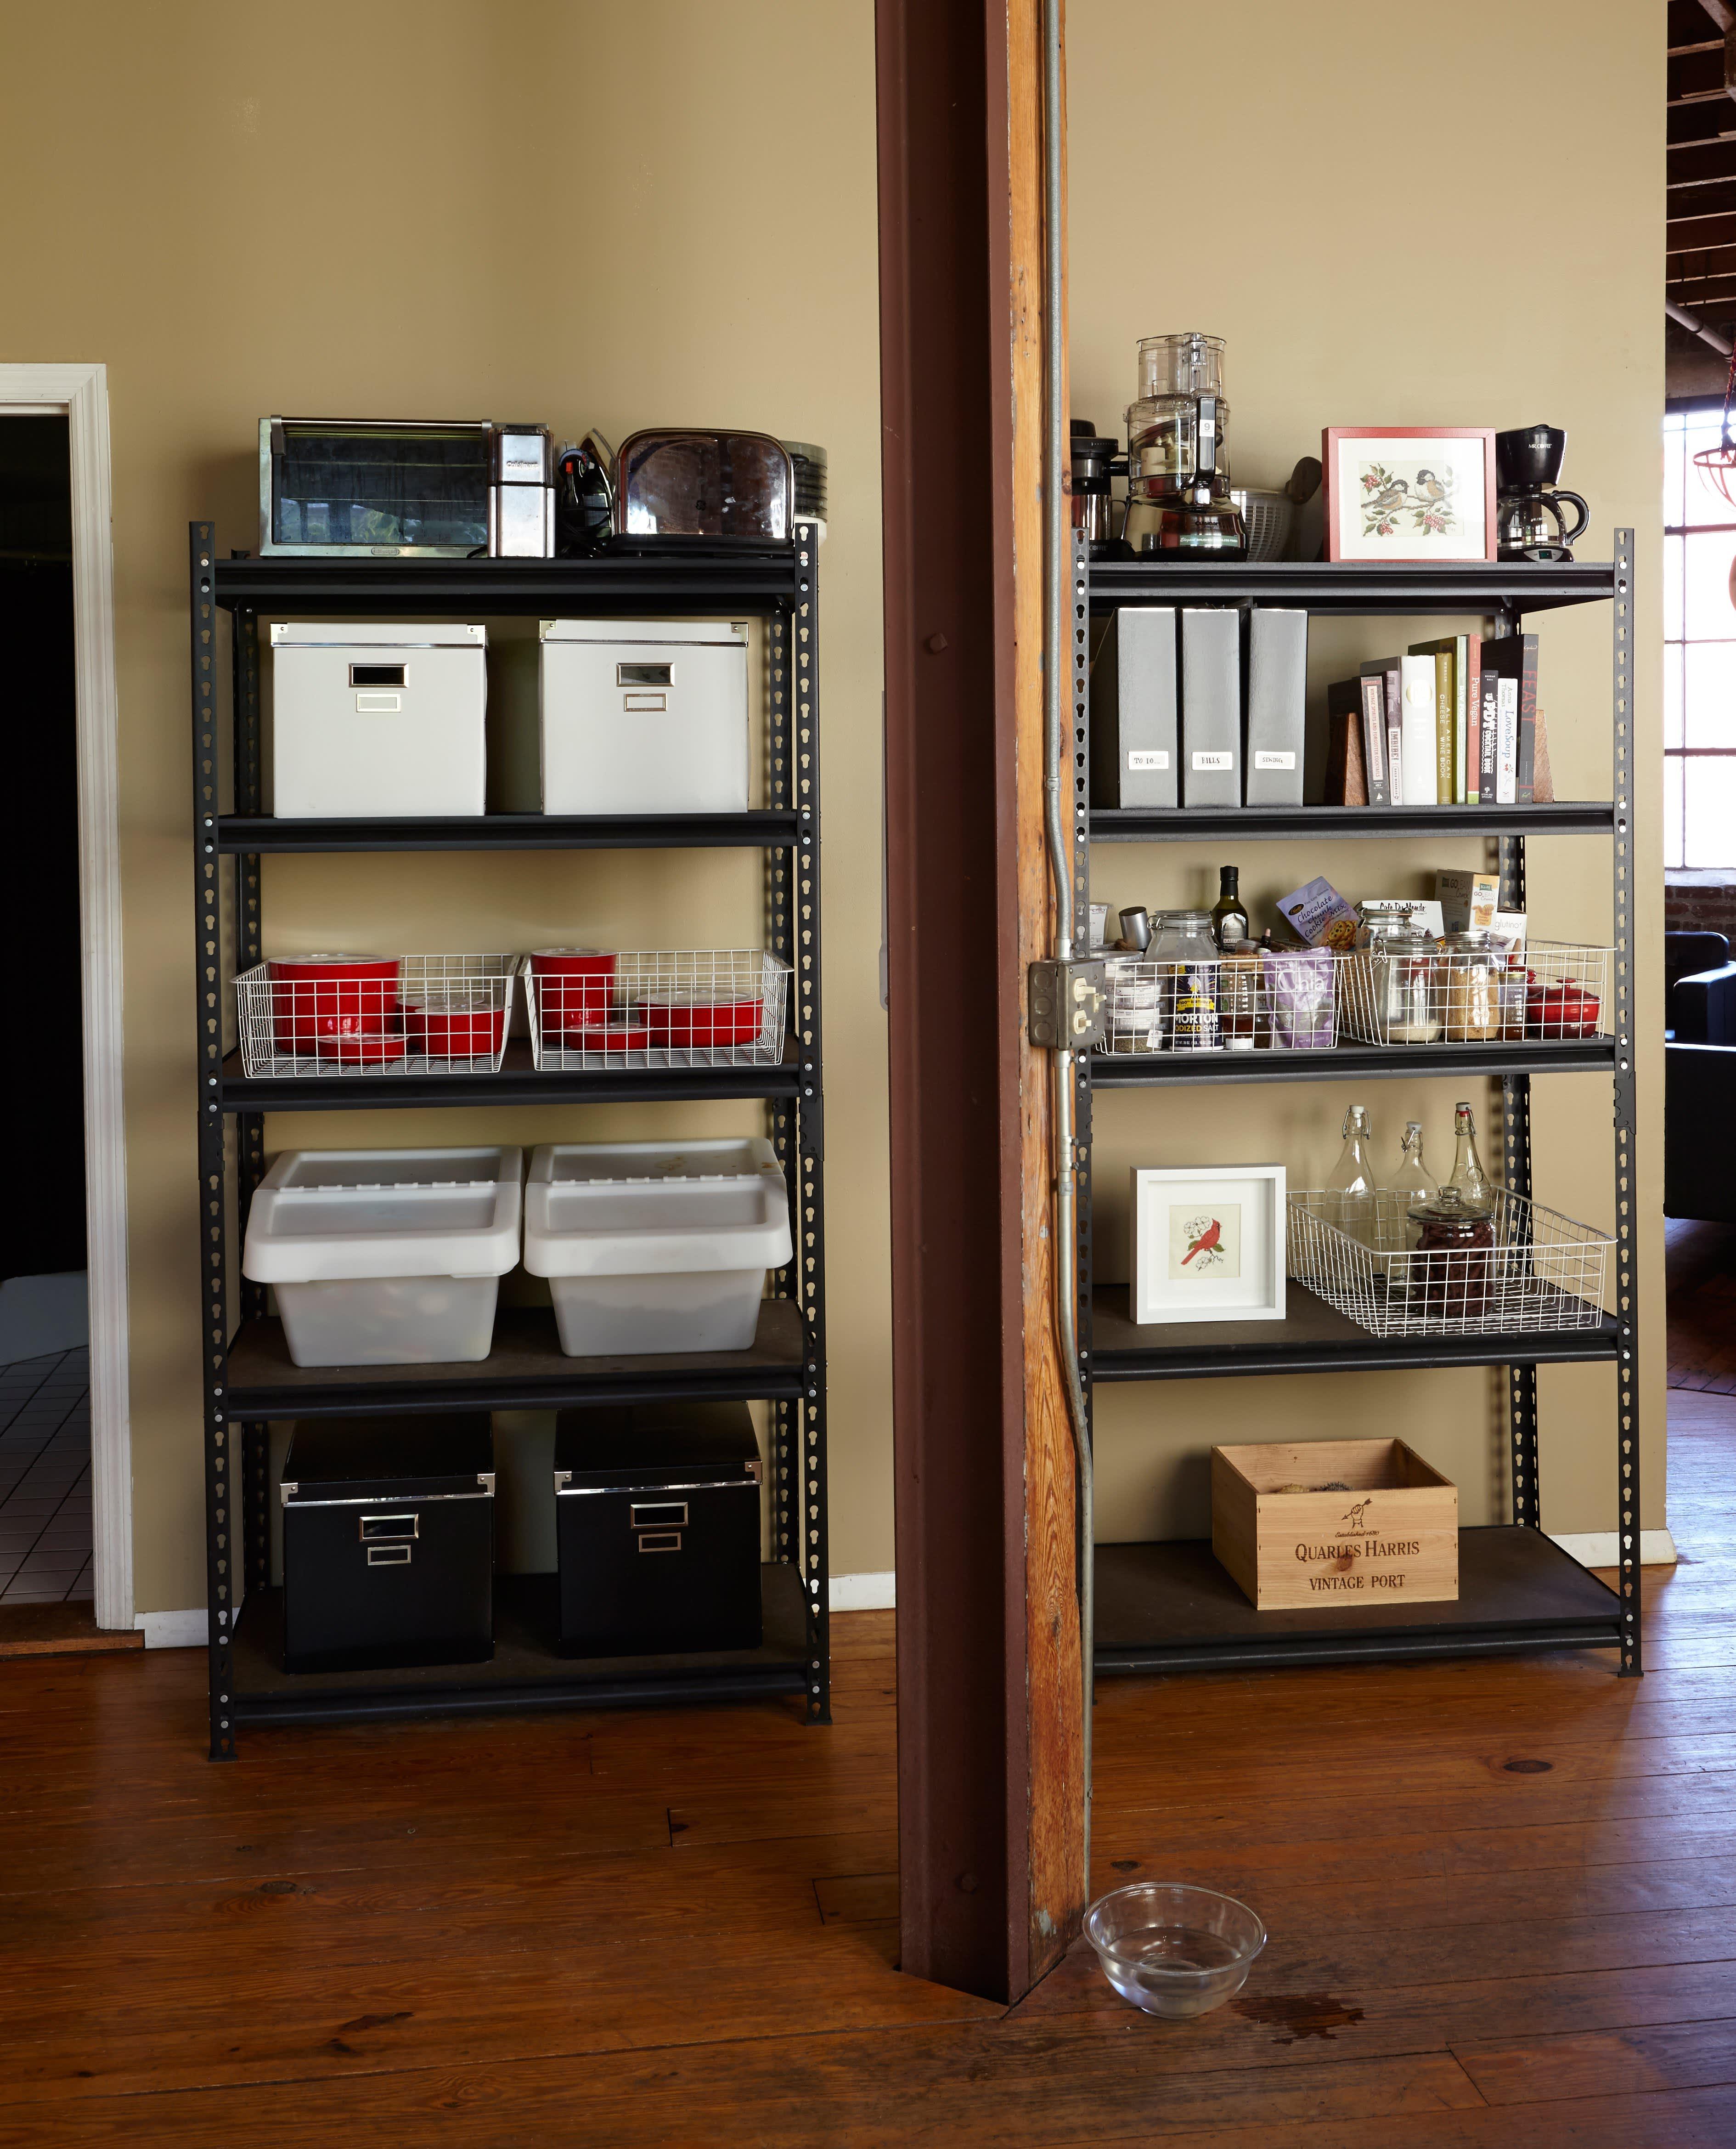 Julia's Open, Antique-Industrial Atlanta Kitchen: gallery image 7